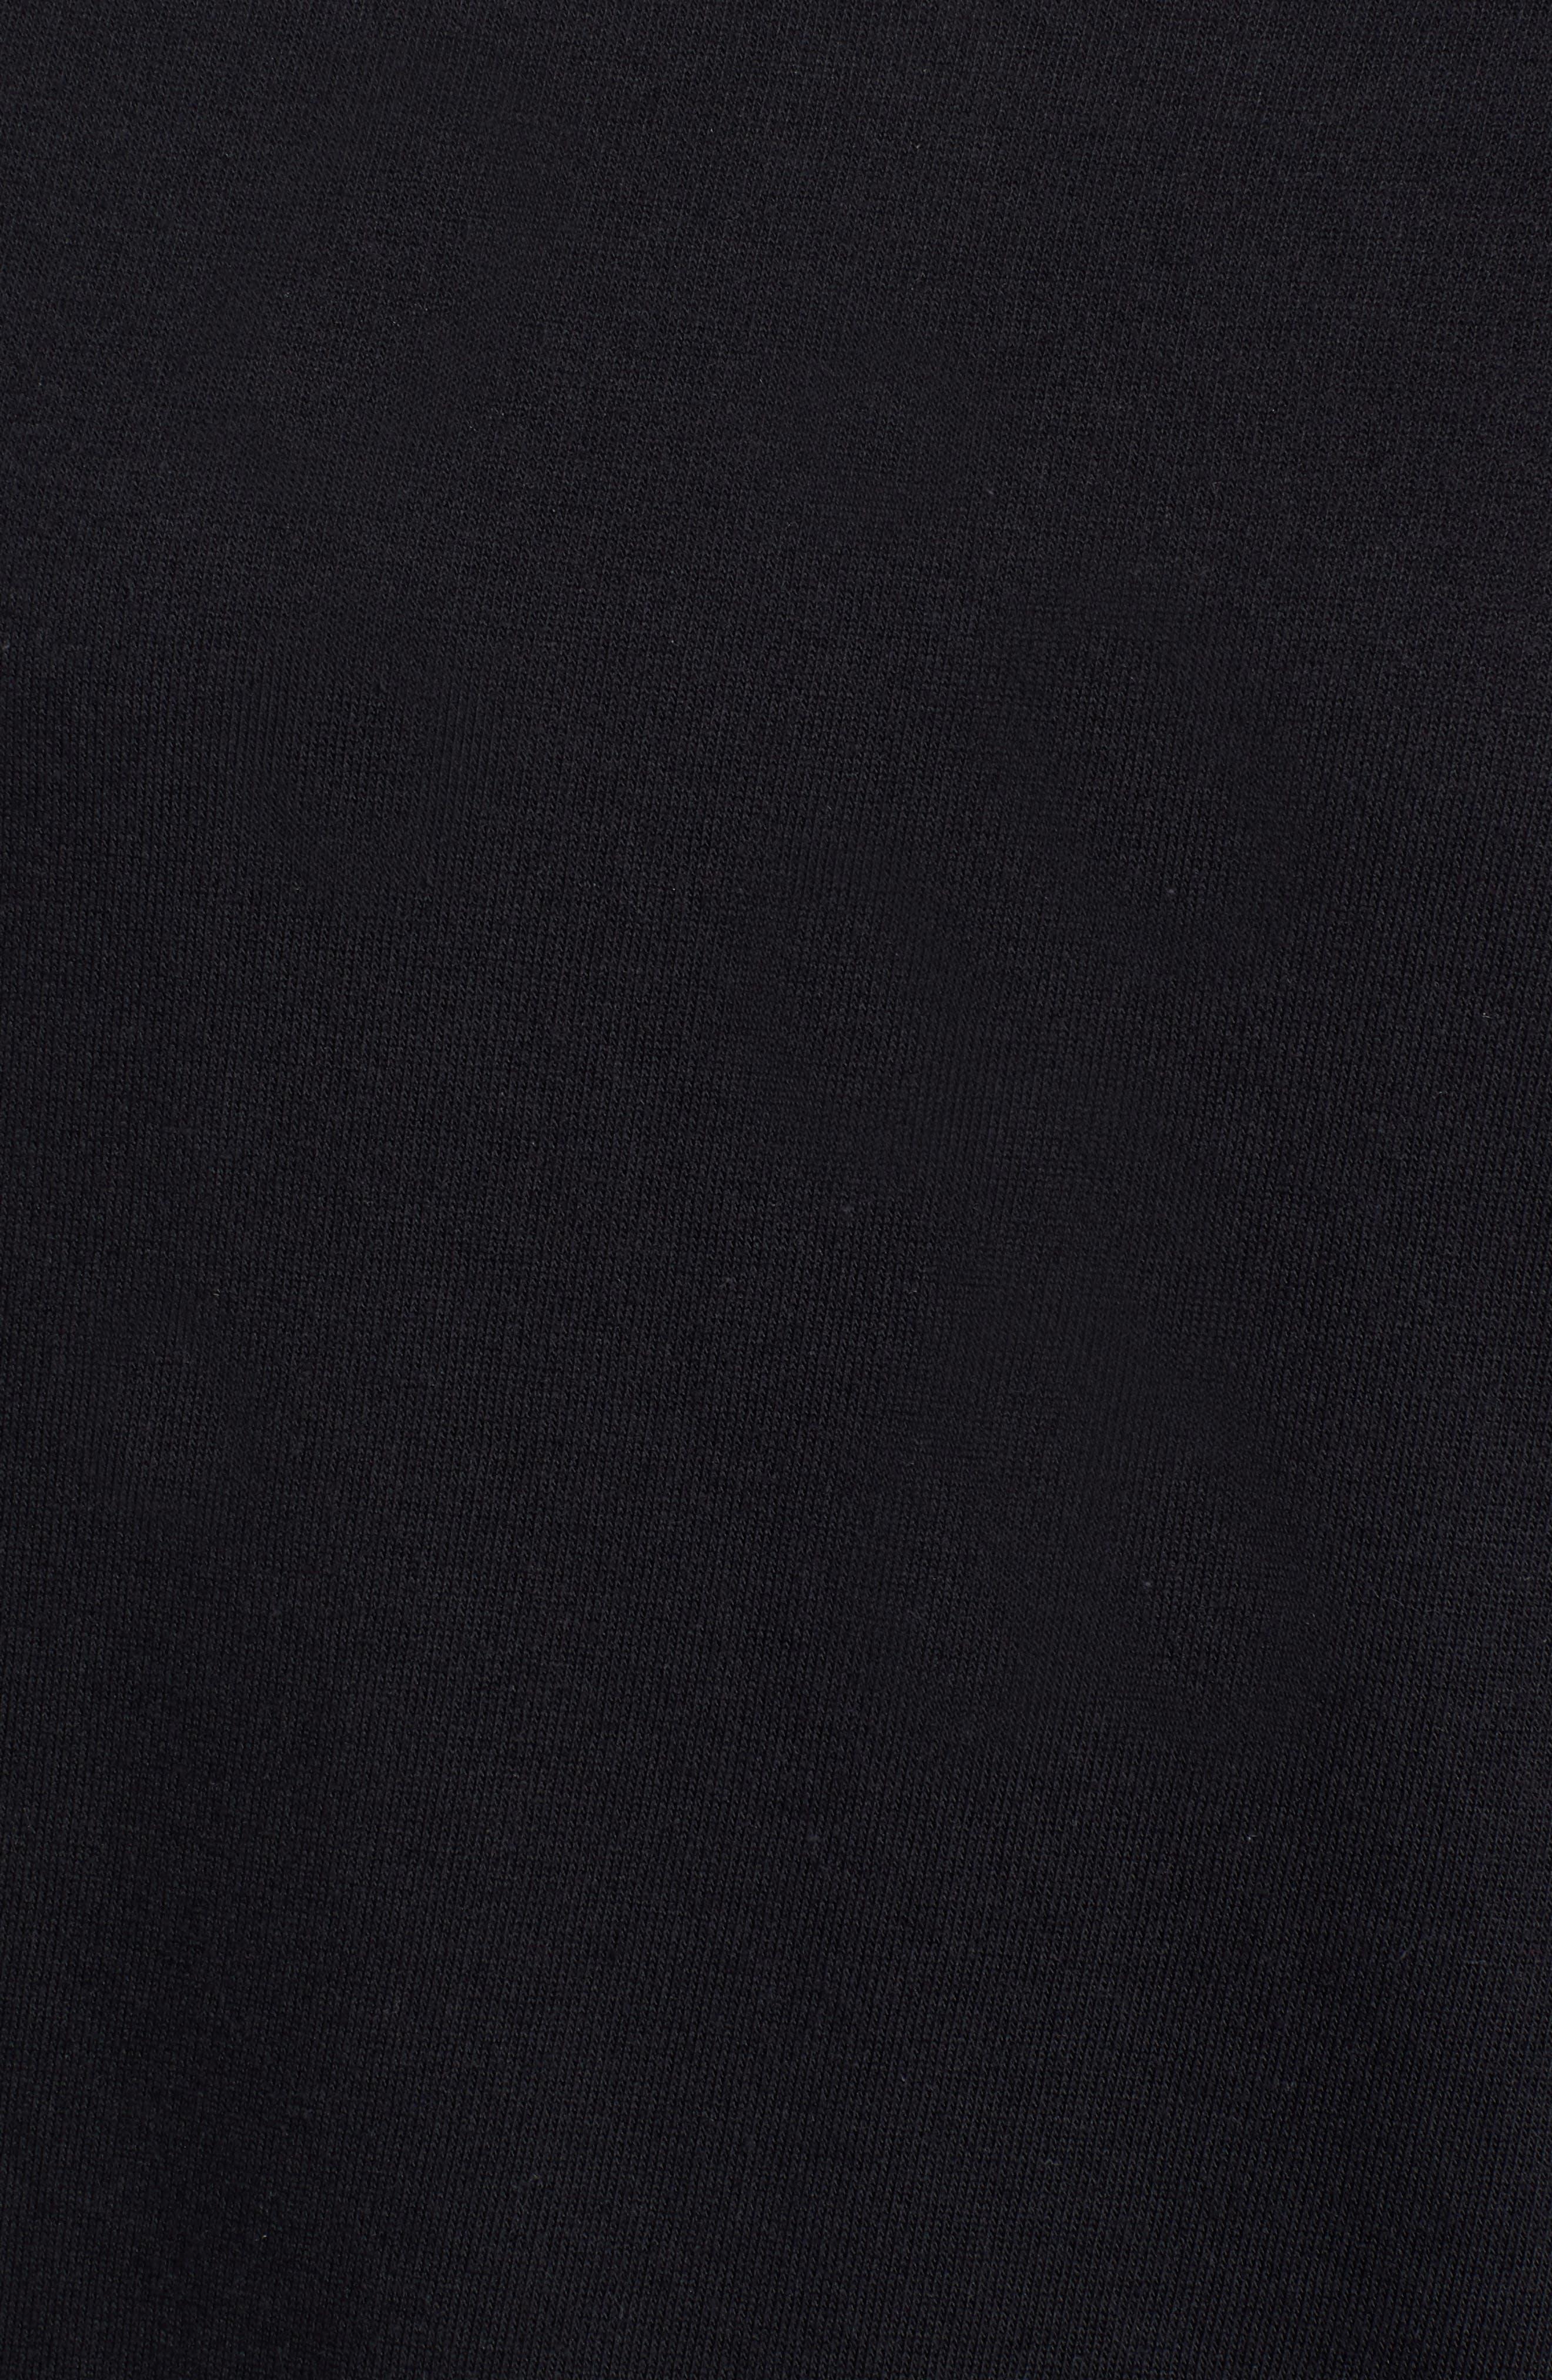 Slouch Sweatshirt,                             Alternate thumbnail 5, color,                             BLACK